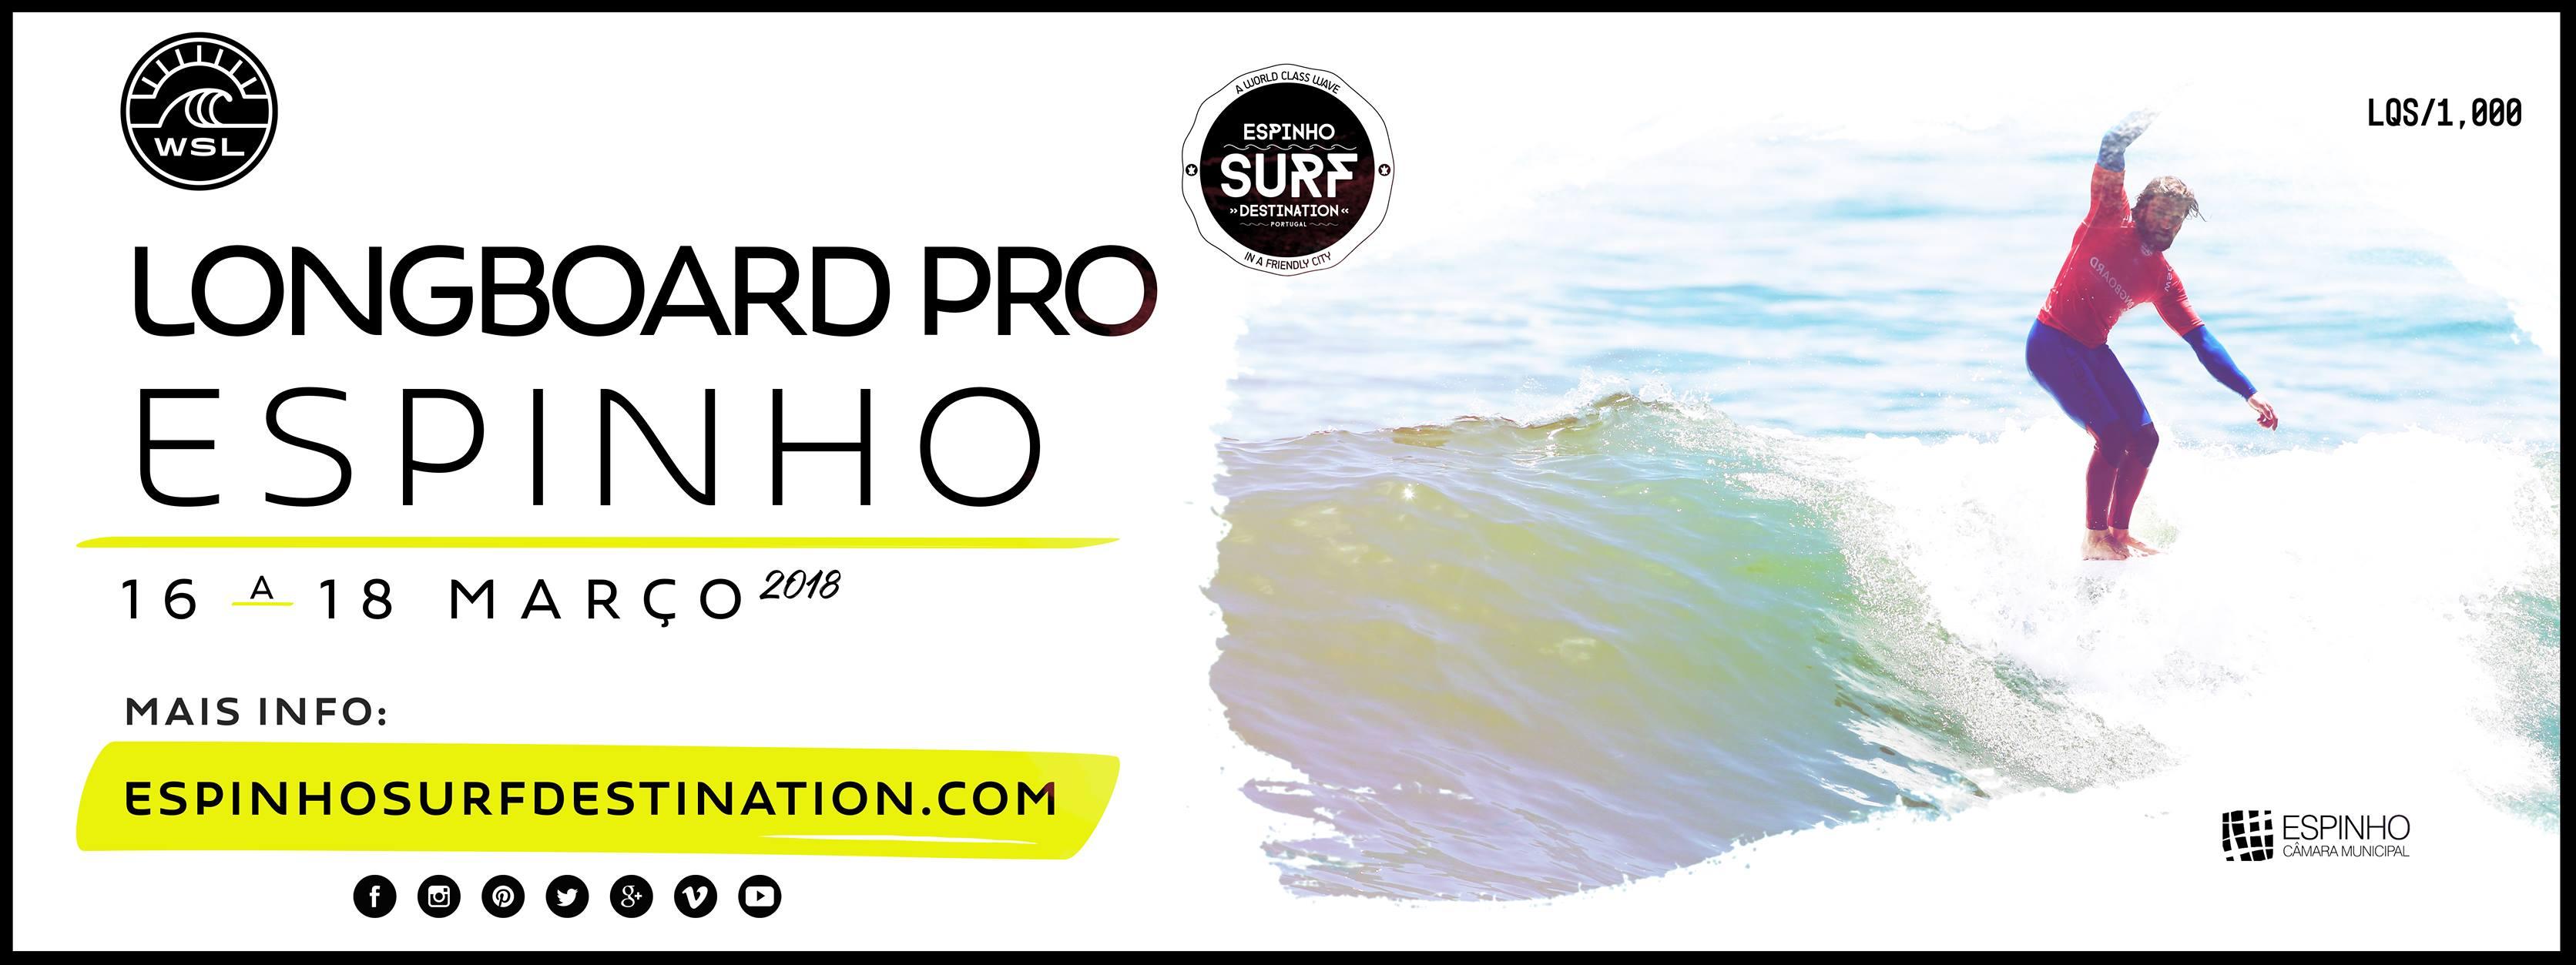 Longboard Pro Espinho :: Surf Pro Espinho 2018